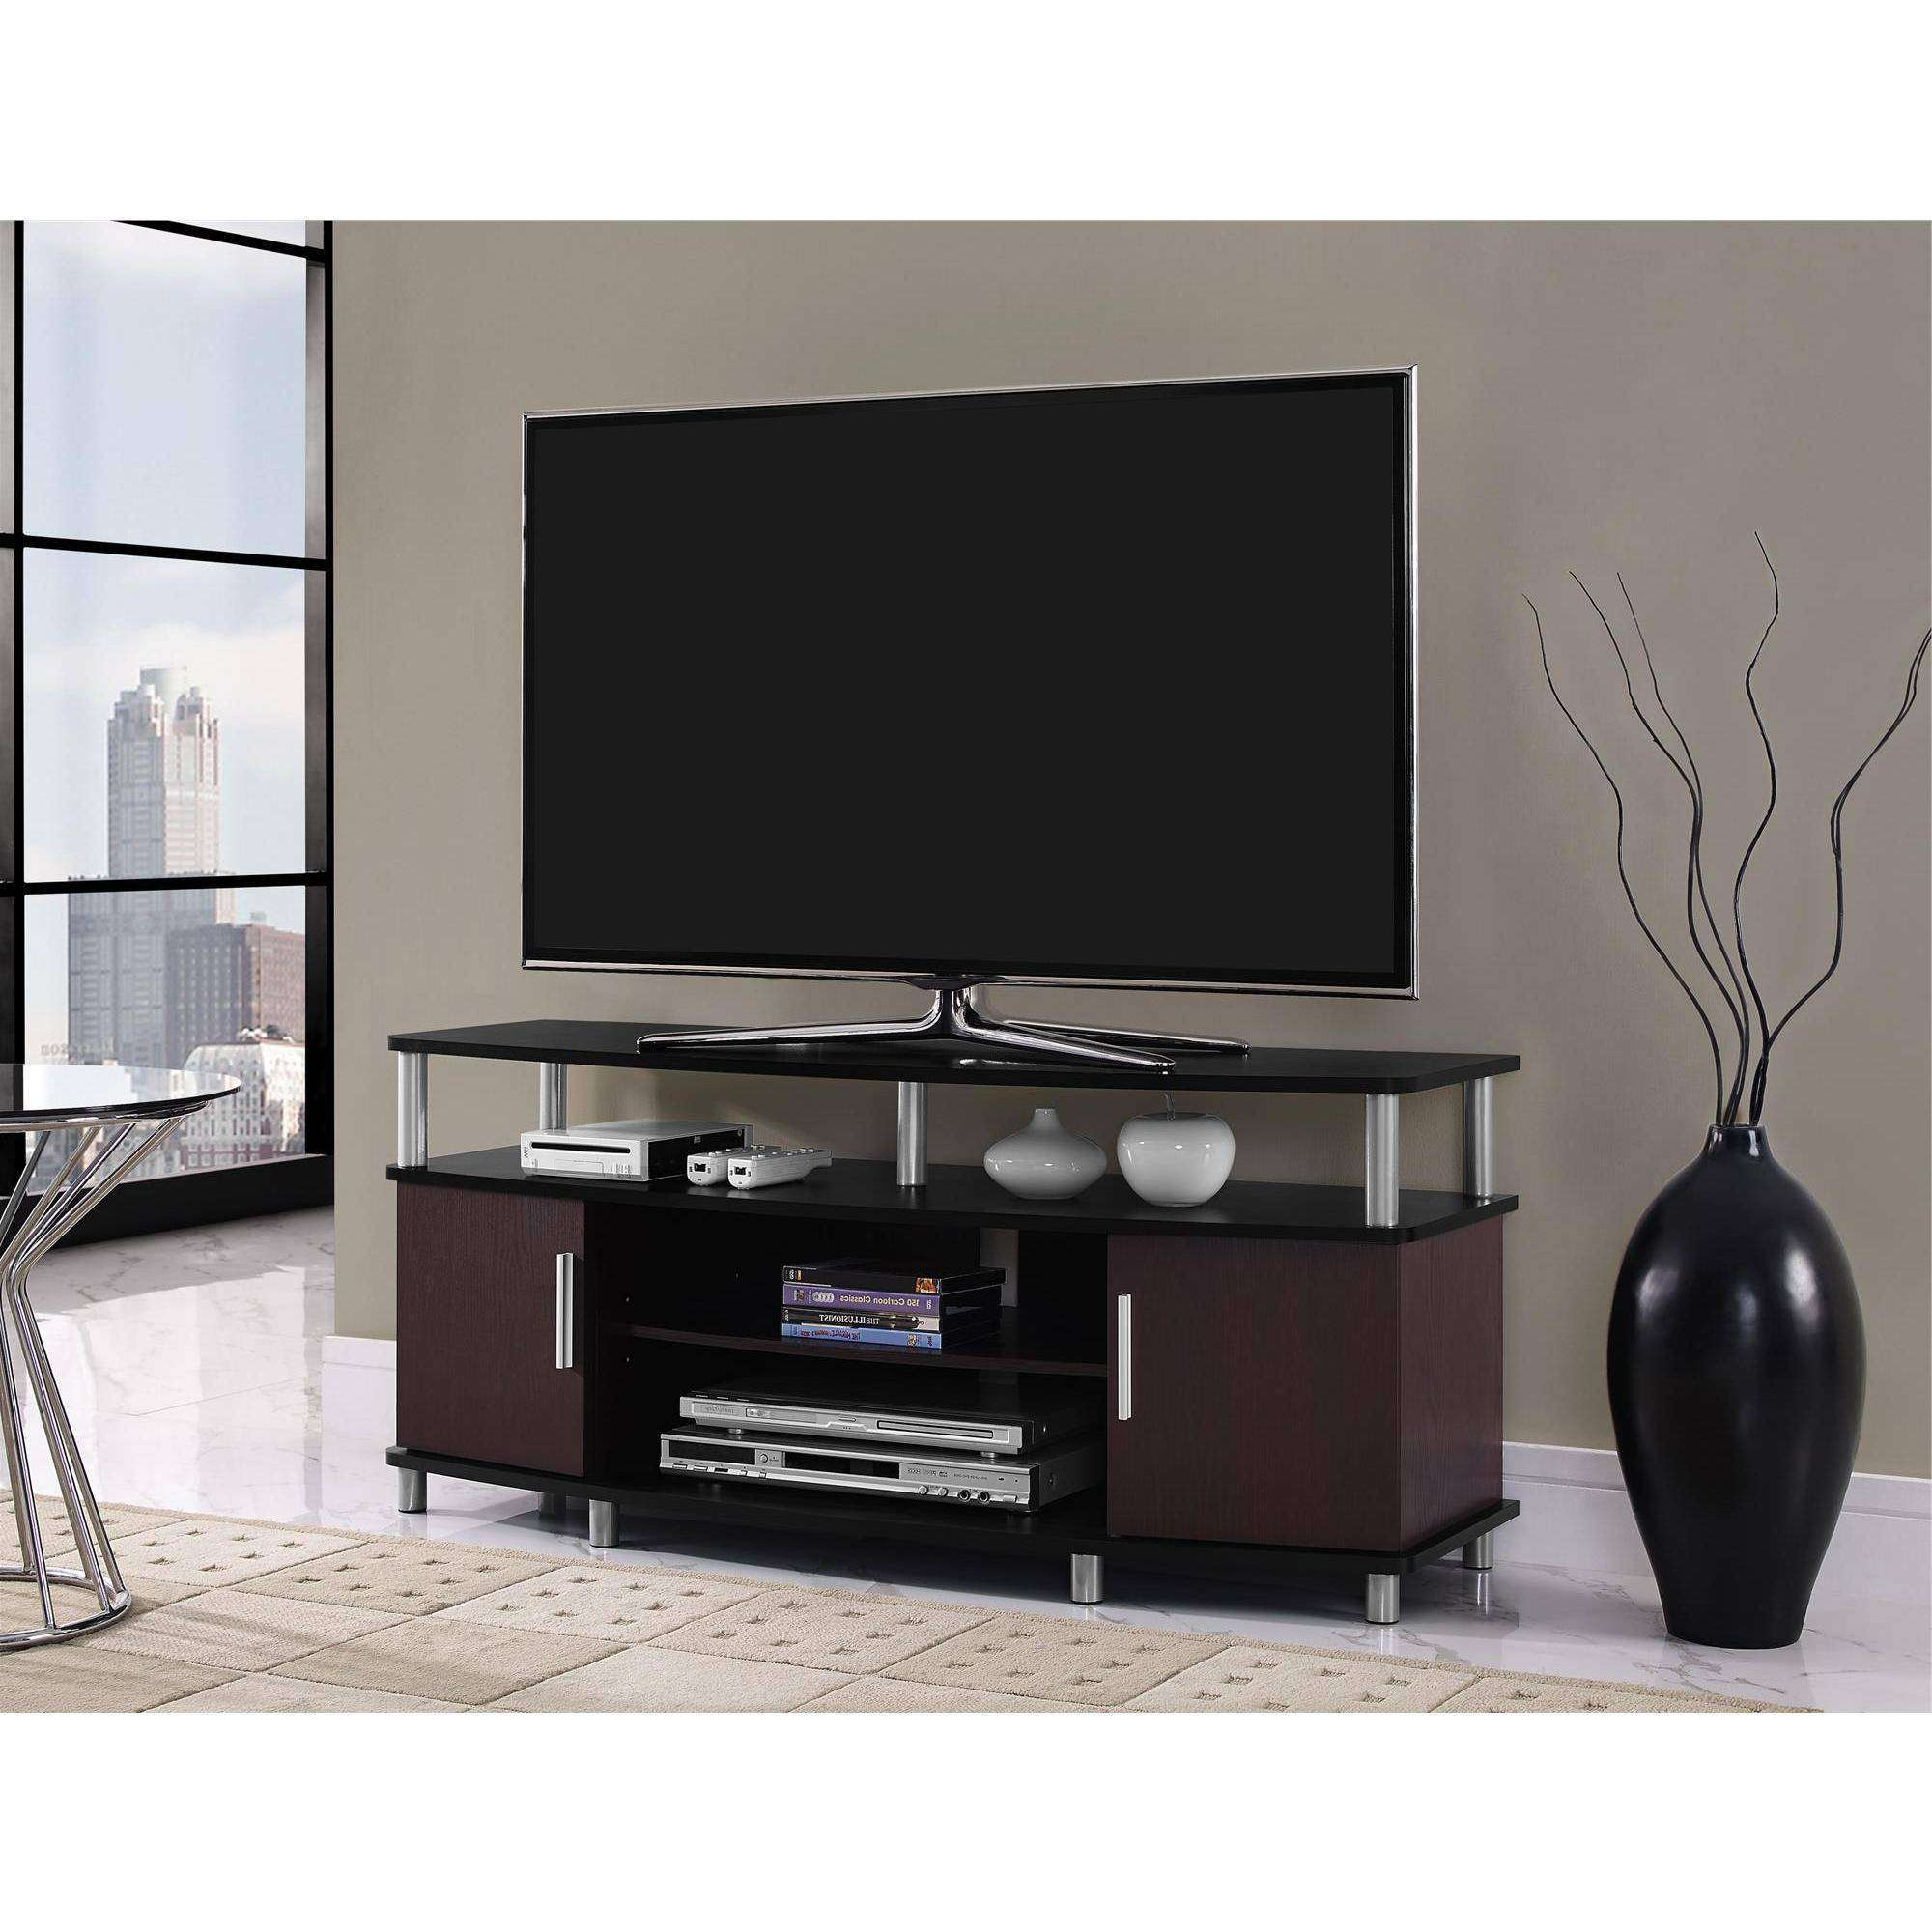 Tv Stands & Entertainment Centers – Walmart Pertaining To Entertainment Center Tv Stands (View 15 of 15)